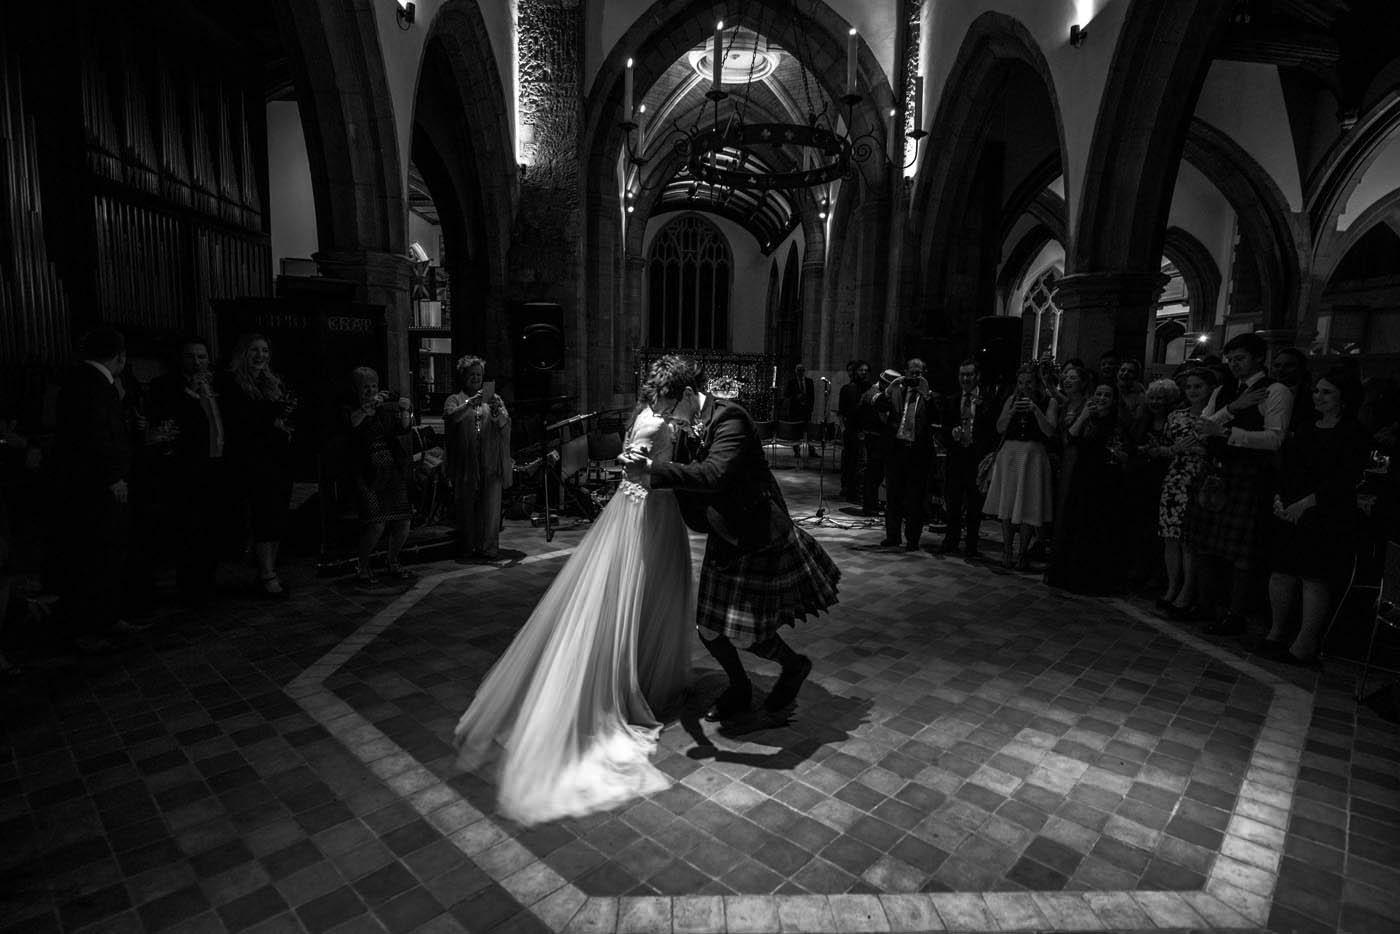 BRIDE-GROOM-FIRST-DANCE-CHURCH.jpg